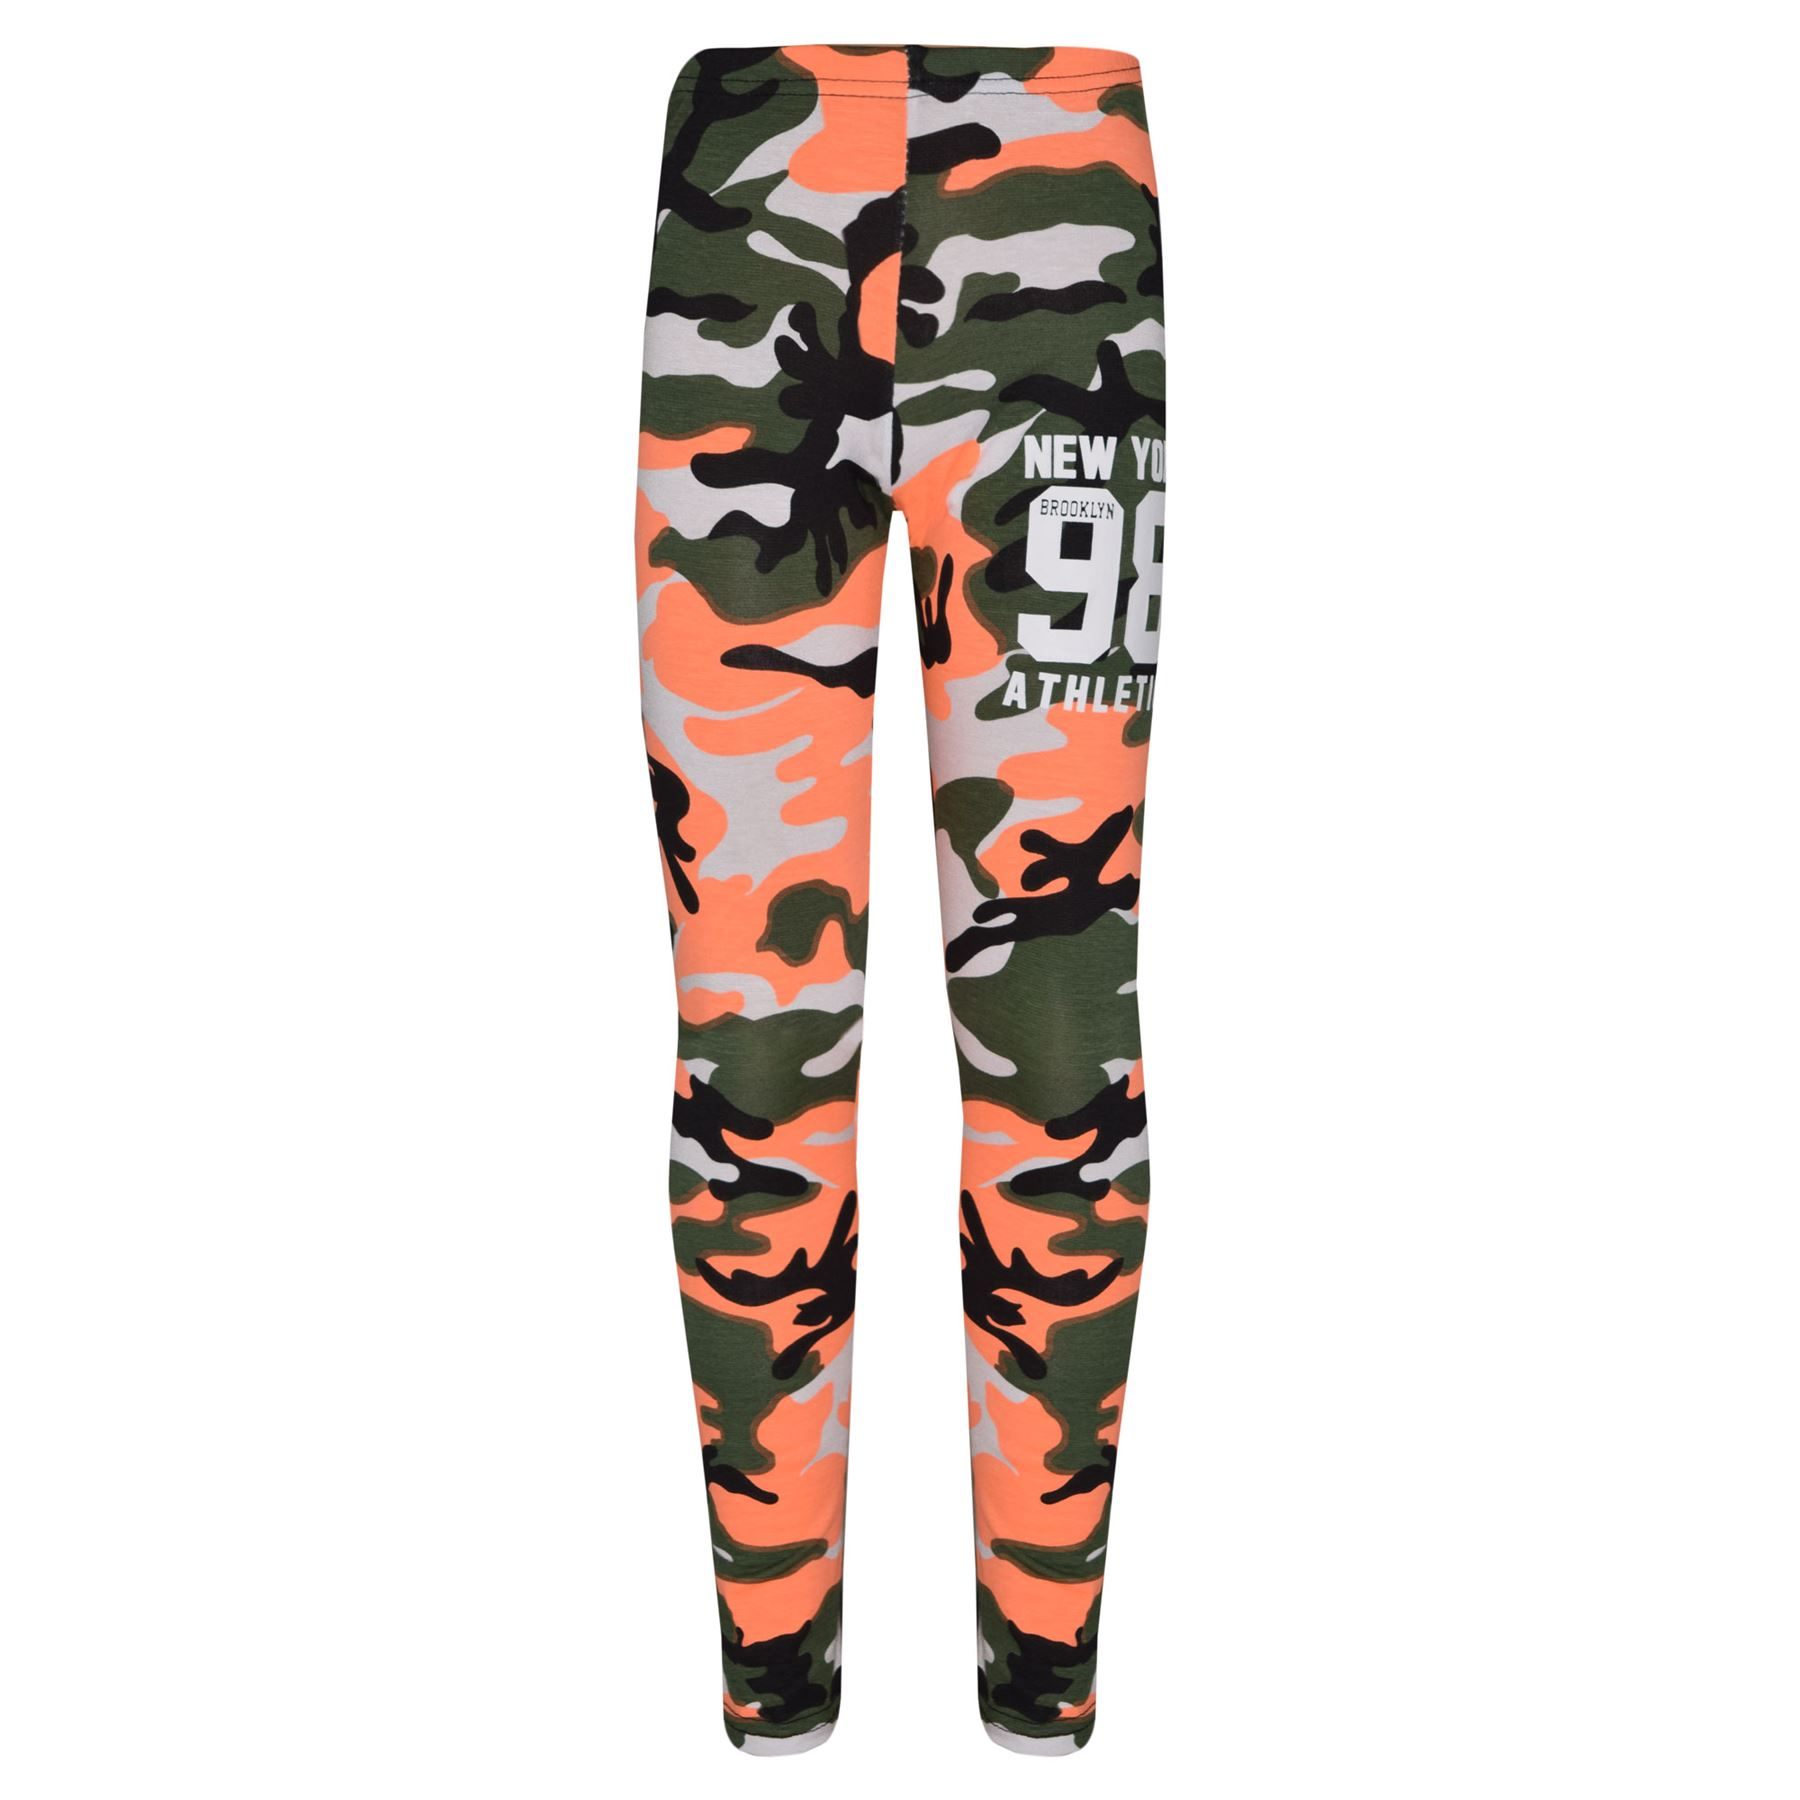 Girls-NEW-YORK-BROOKLYN-98-ATHLECTIC-Camouflage-Print-Top-amp-Legging-Set-7-13-Yr thumbnail 44